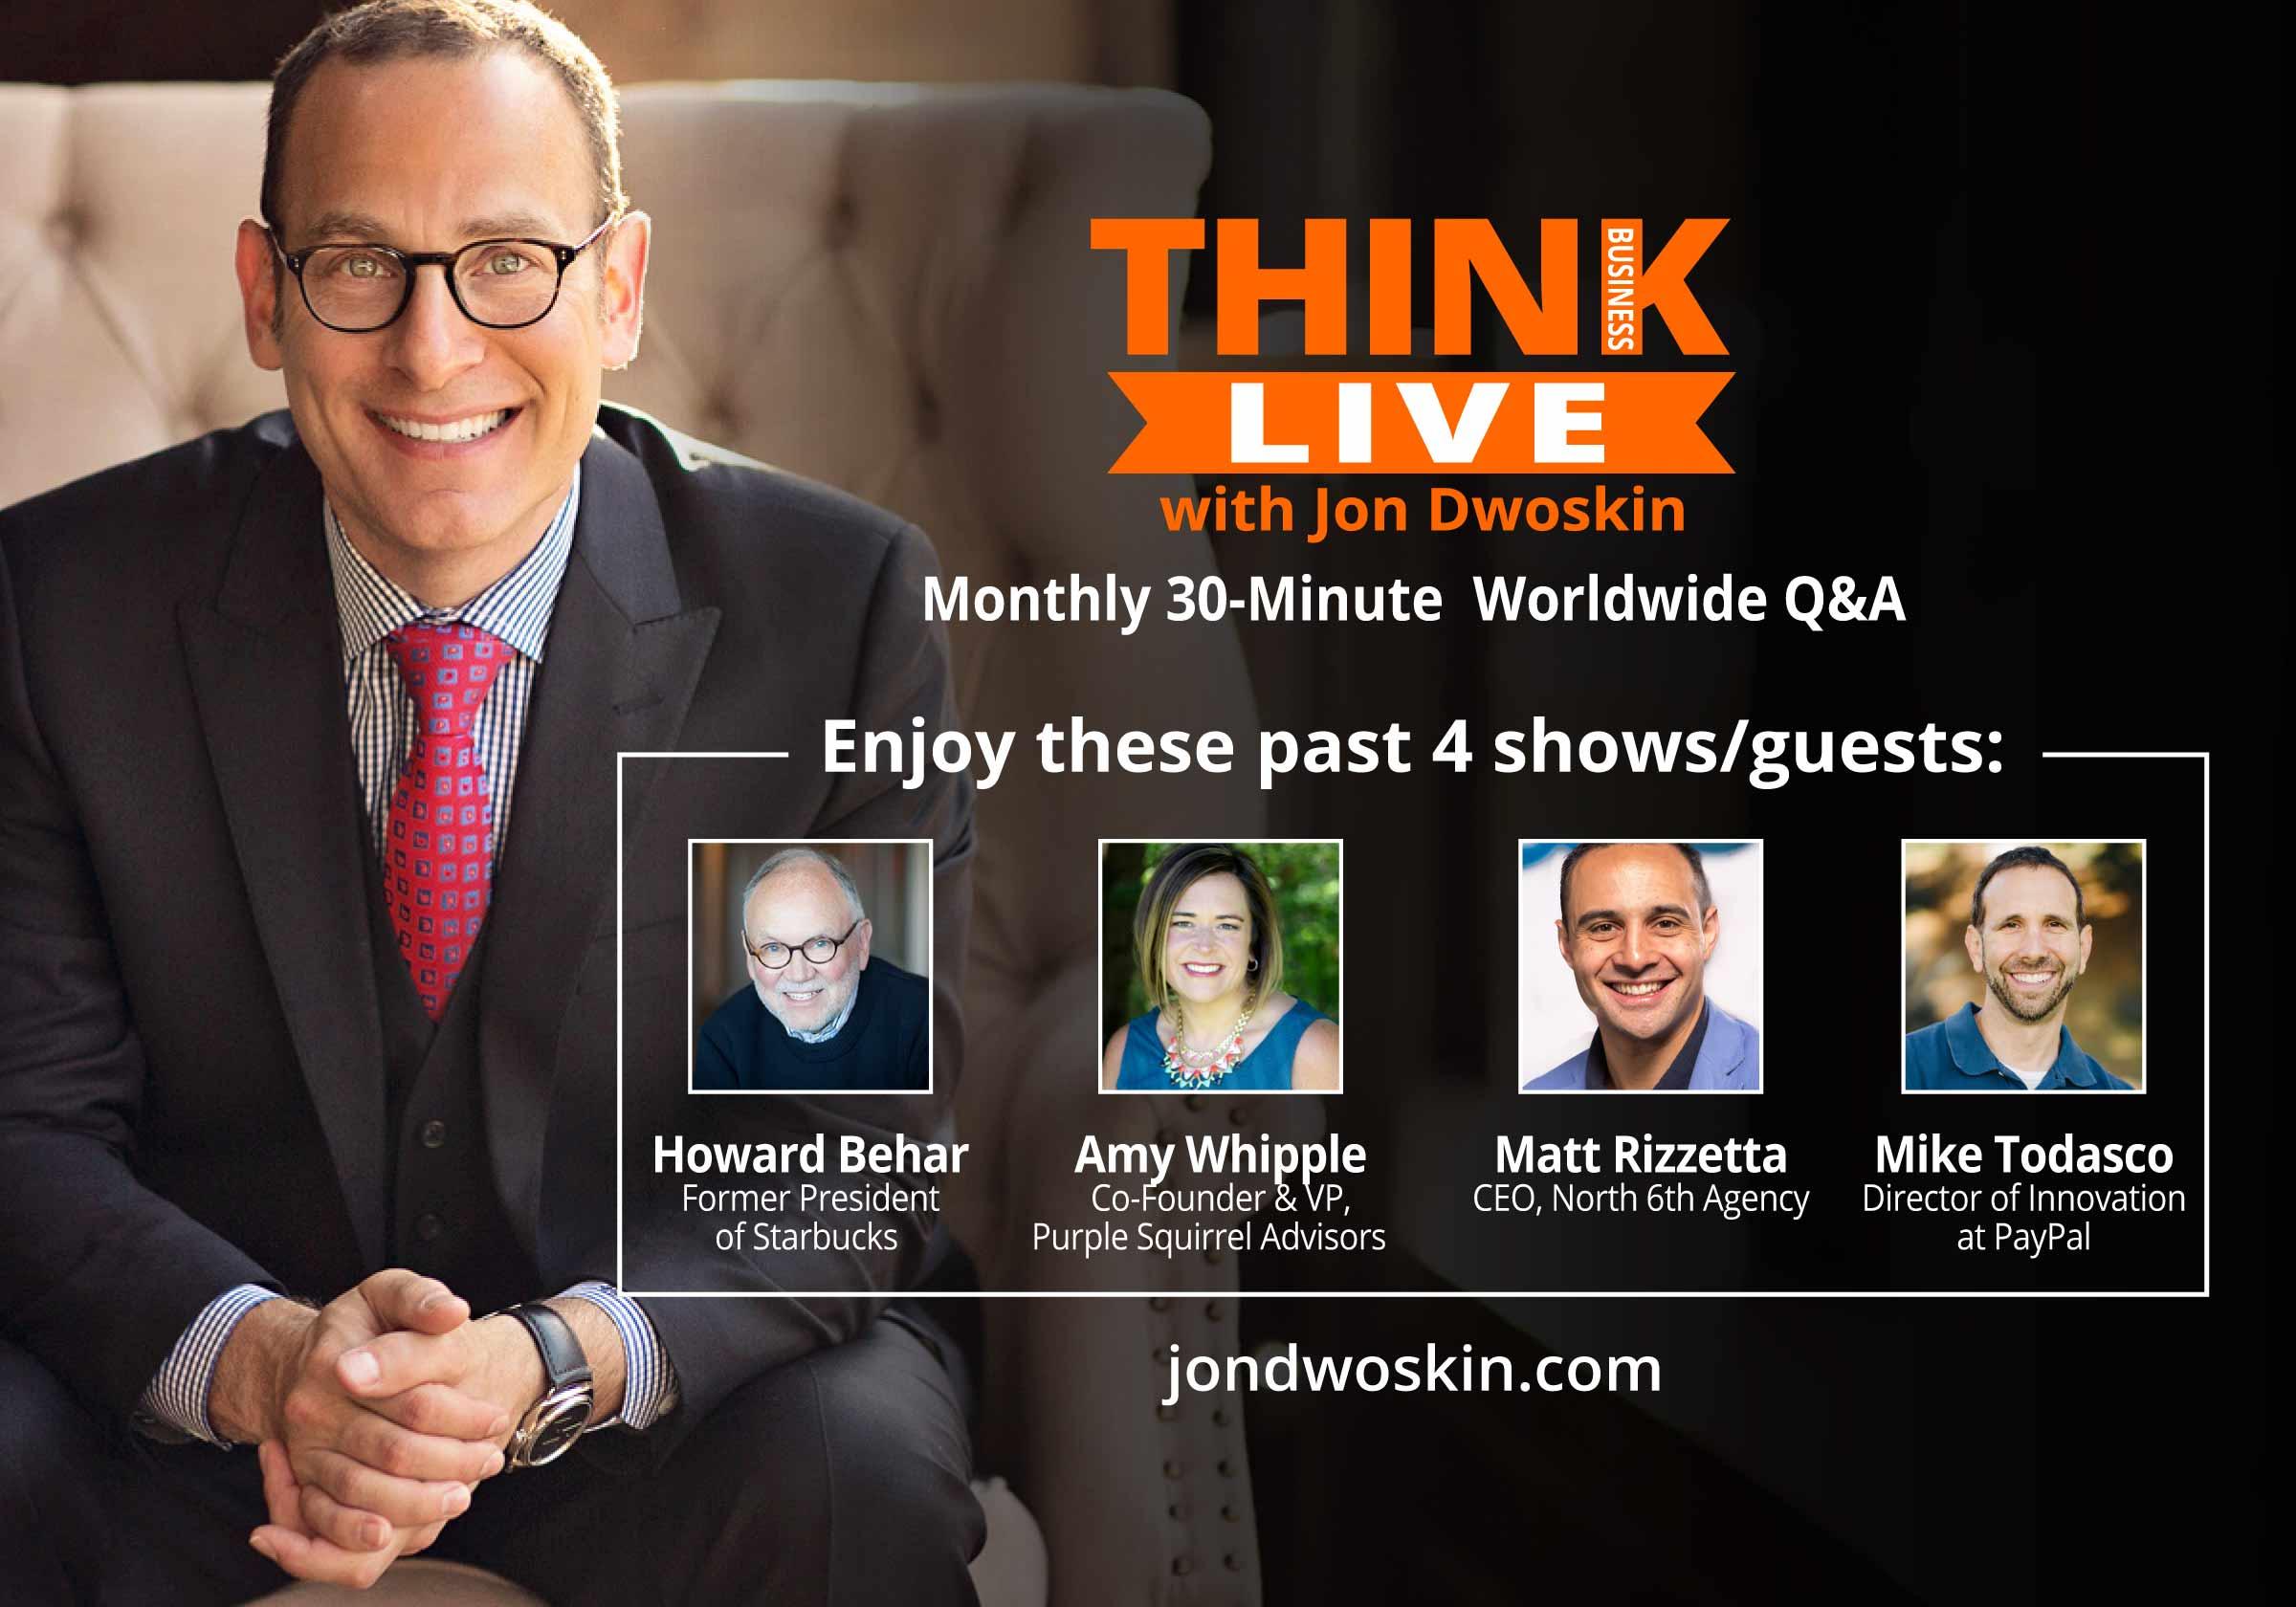 Jon Dwoskin Business Blog: